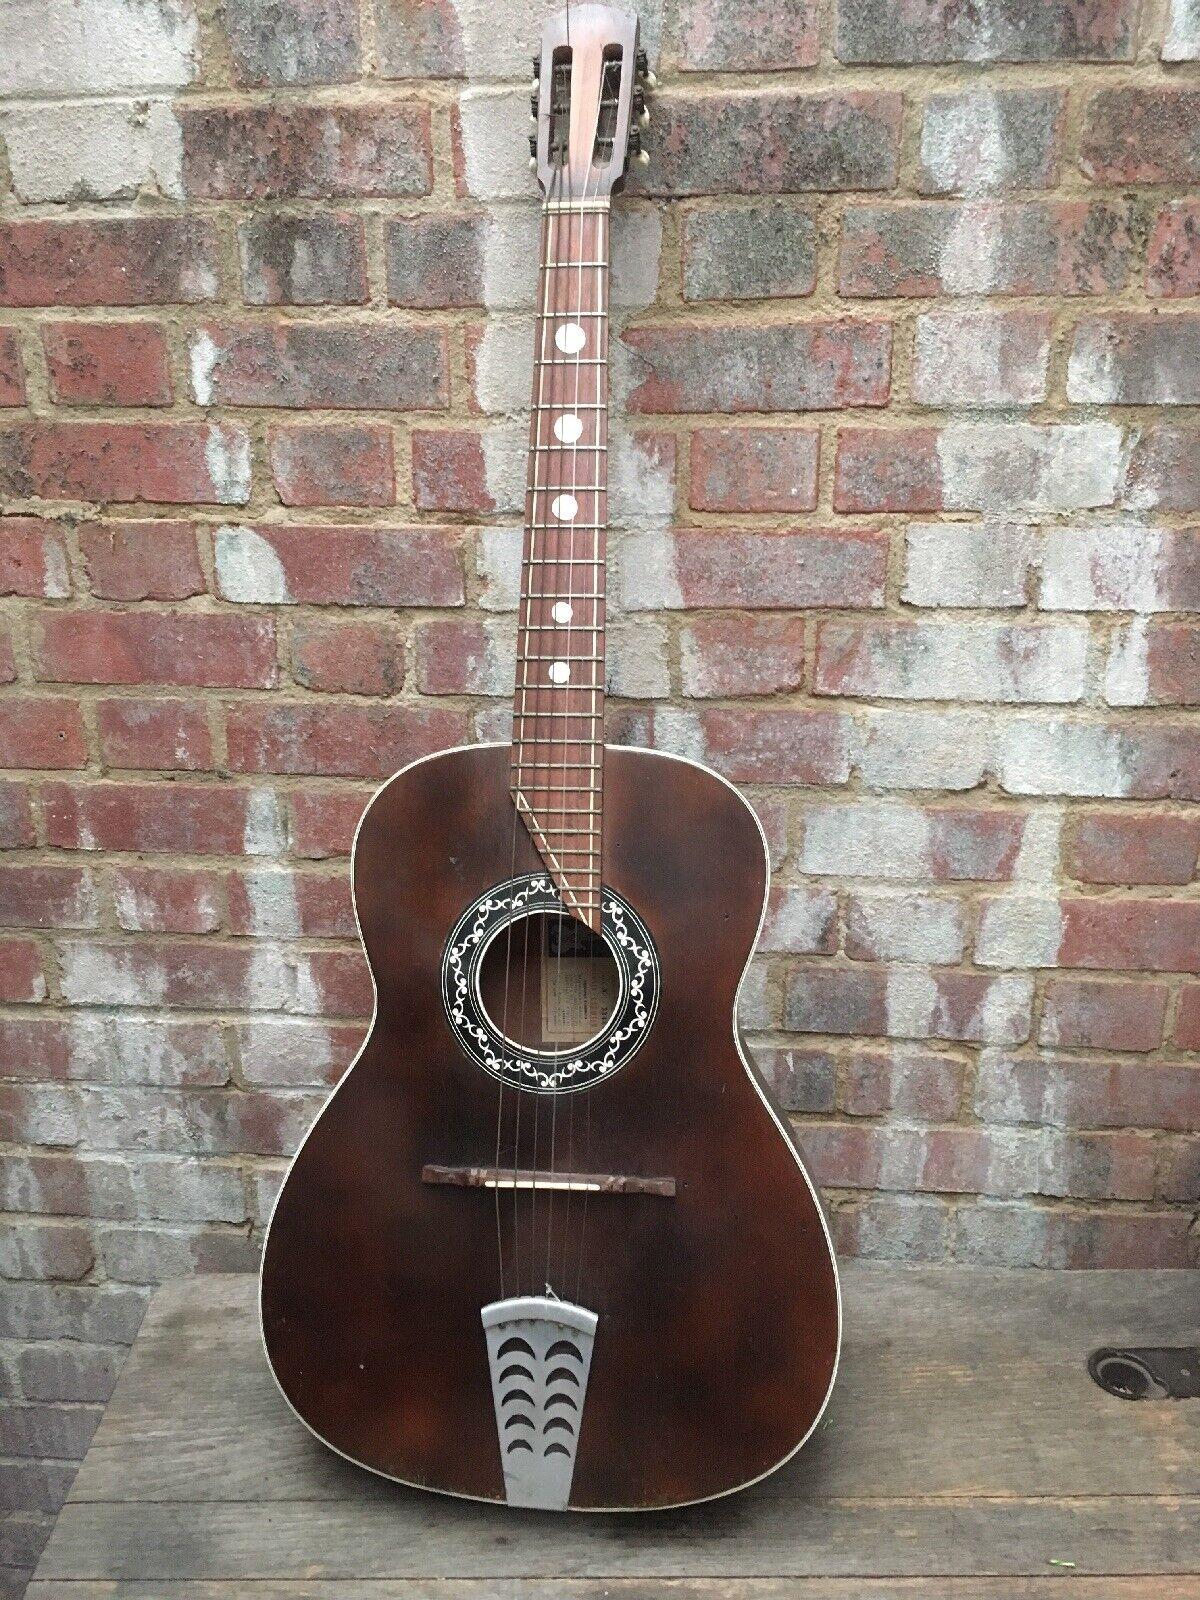 Vintage Catania Carmelo 5 12  1957 Guitar  tarra Tip N 16  Acoustic 1950s